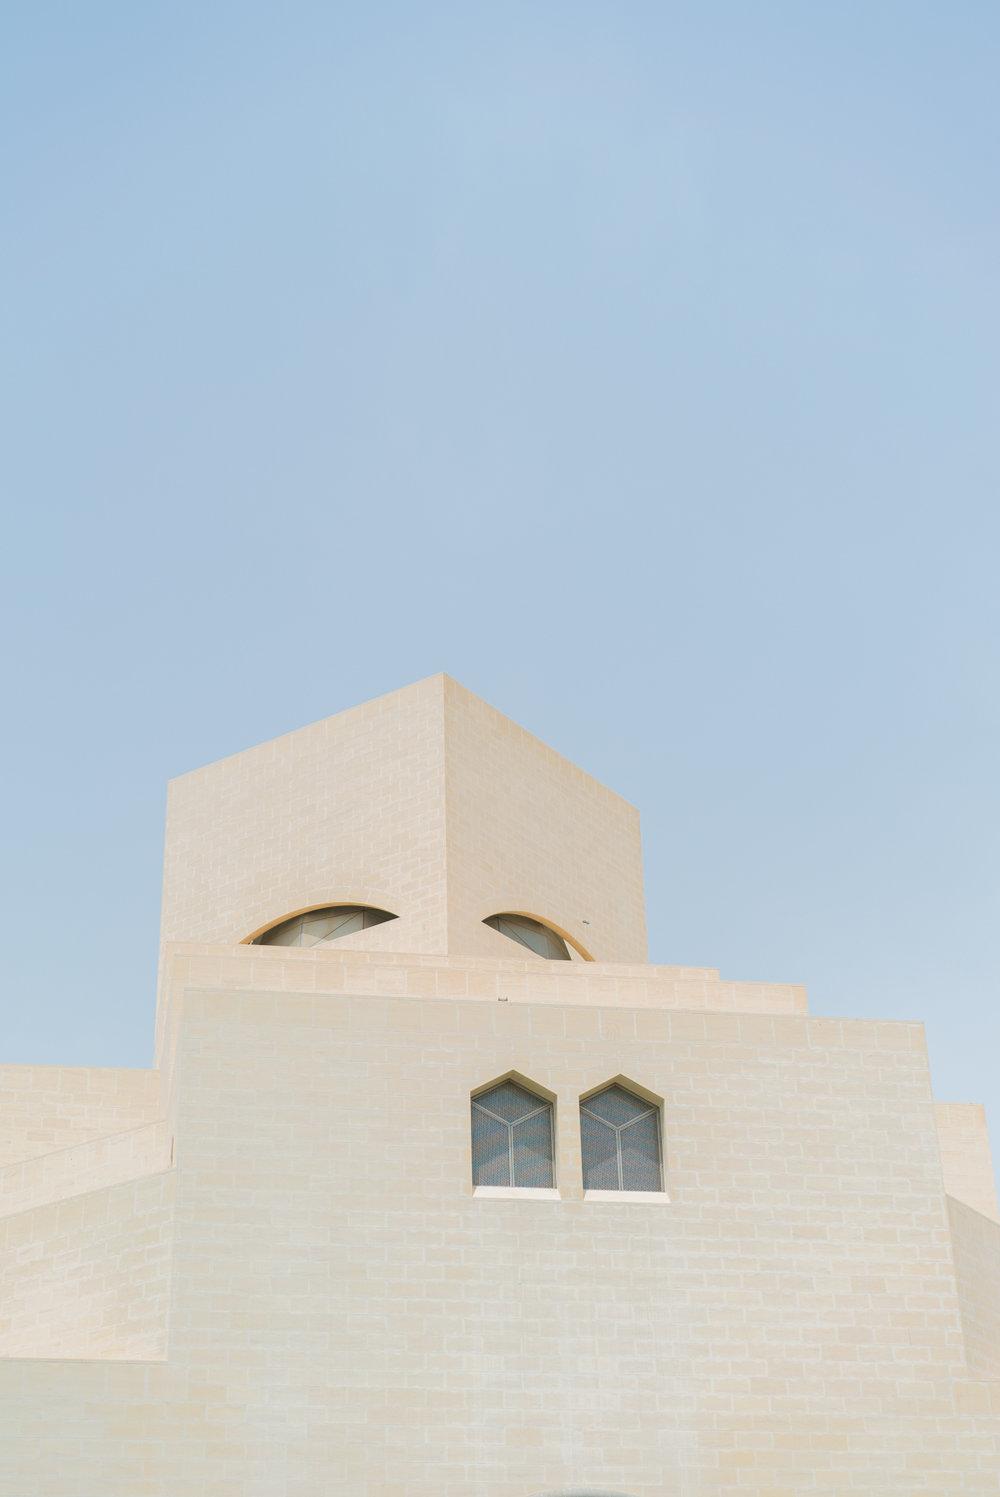 Qatar, UAE